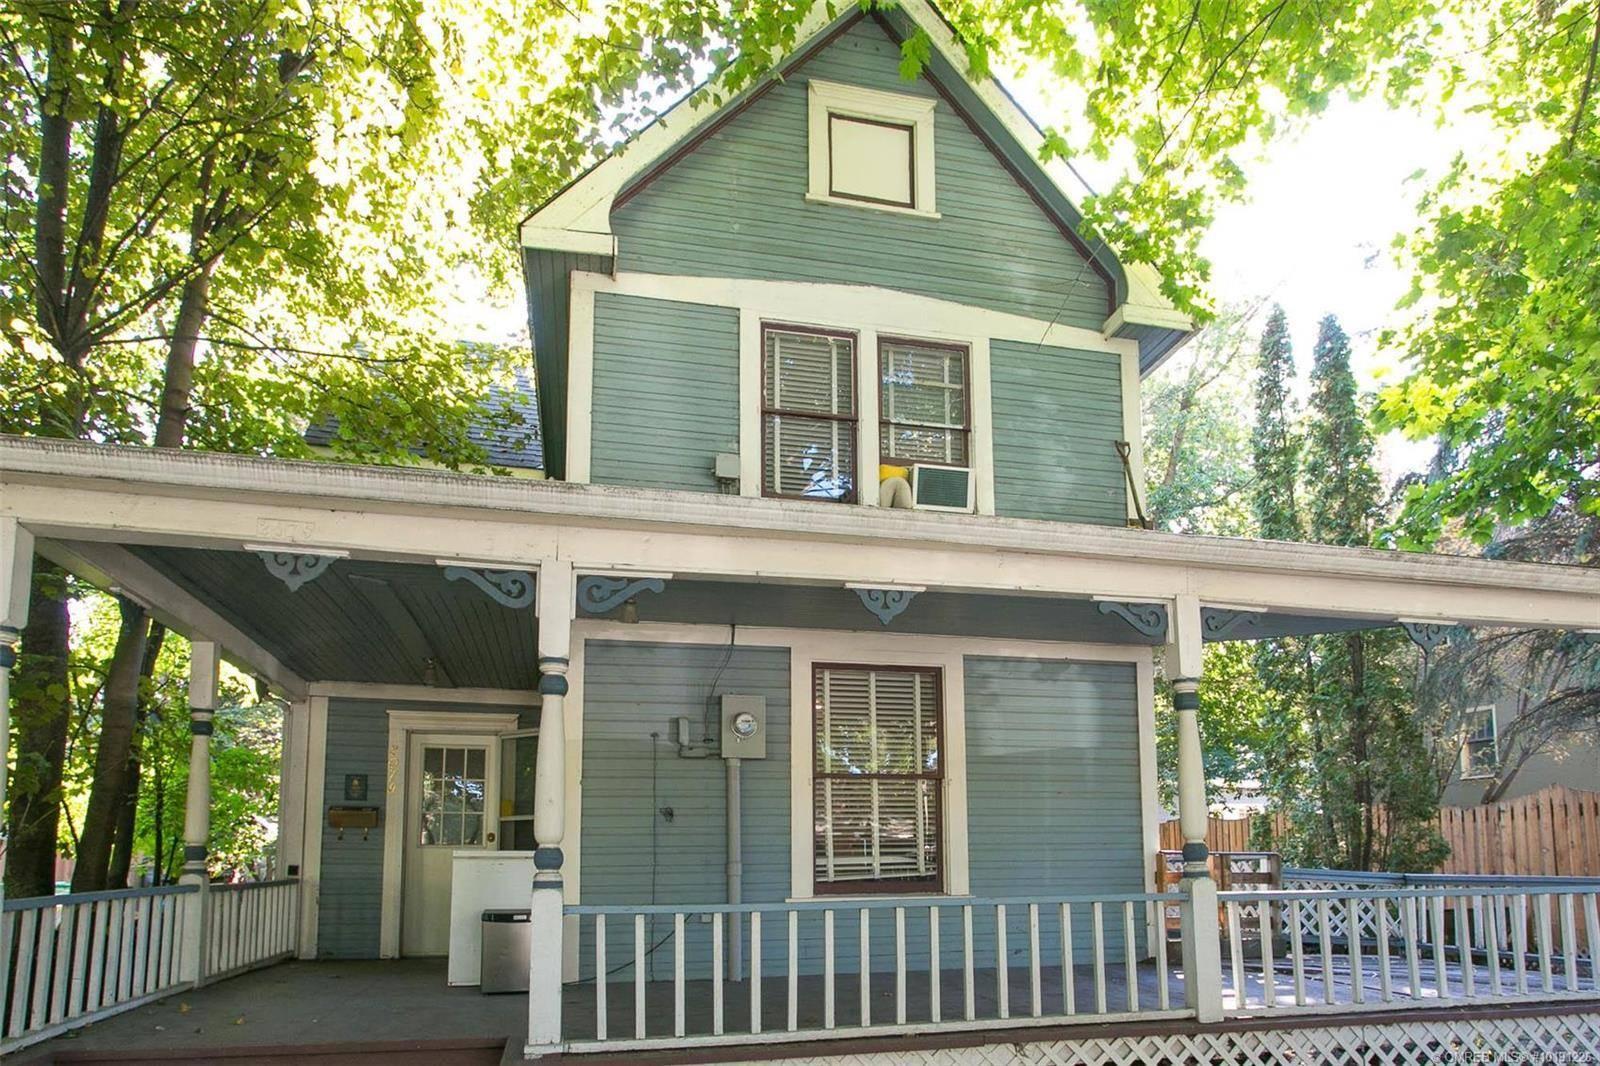 House for sale at 2079 Pandosy St Kelowna British Columbia - MLS: 10191226